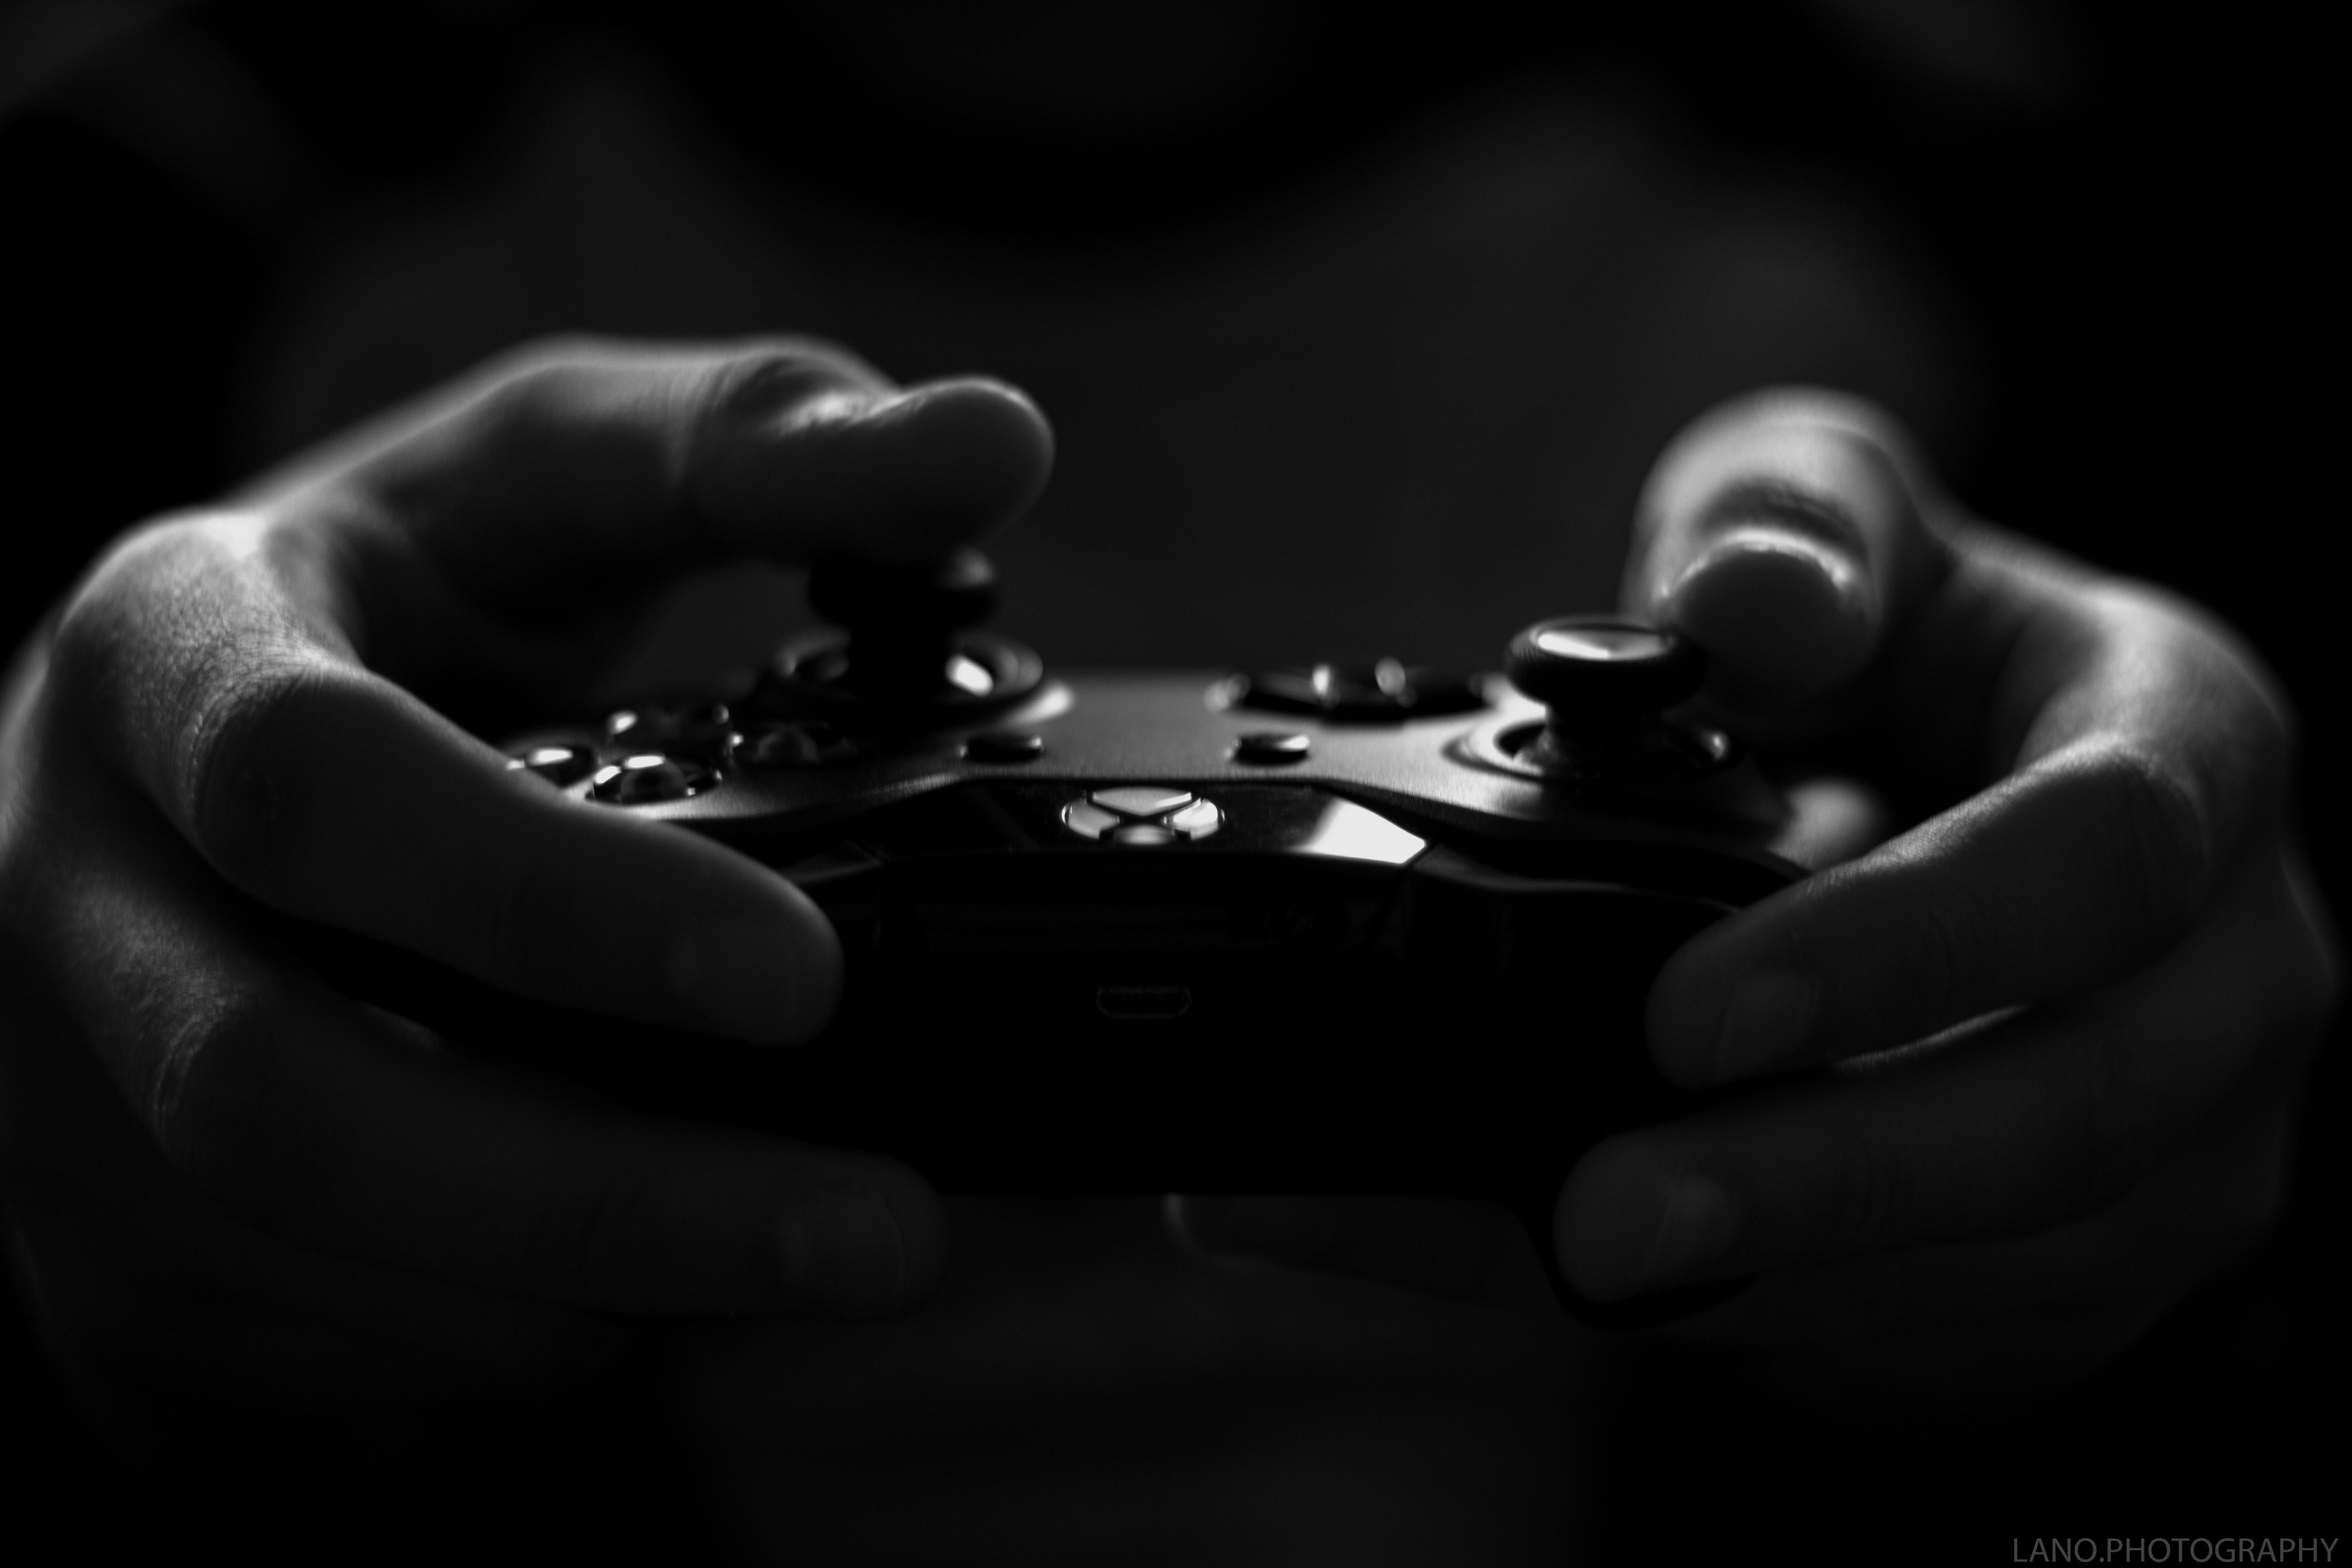 game art production meliorgames.com photo